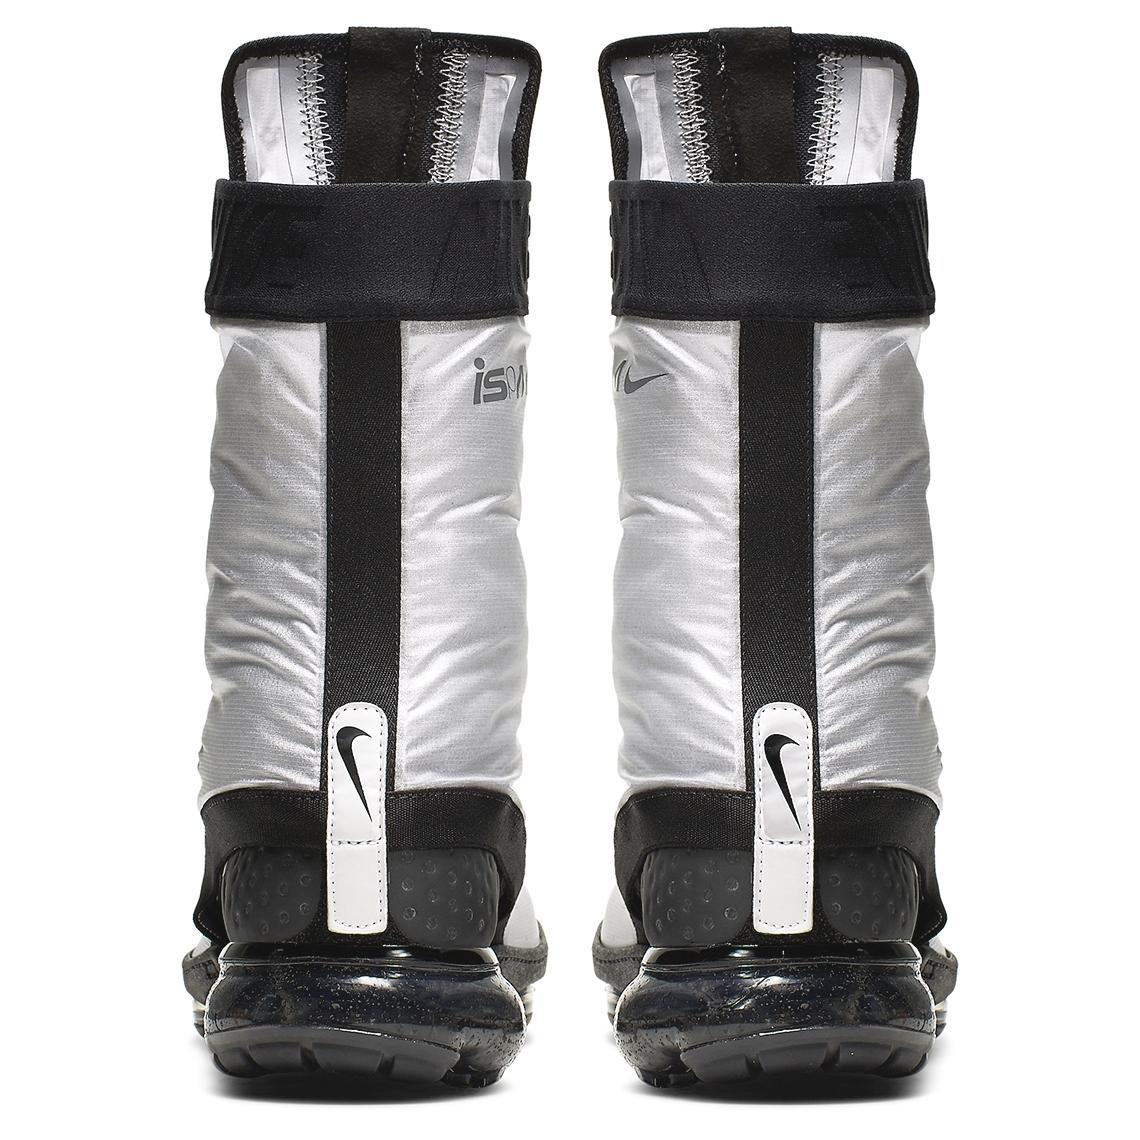 Nike Vapormax Flyknit Gator ISPA Silver